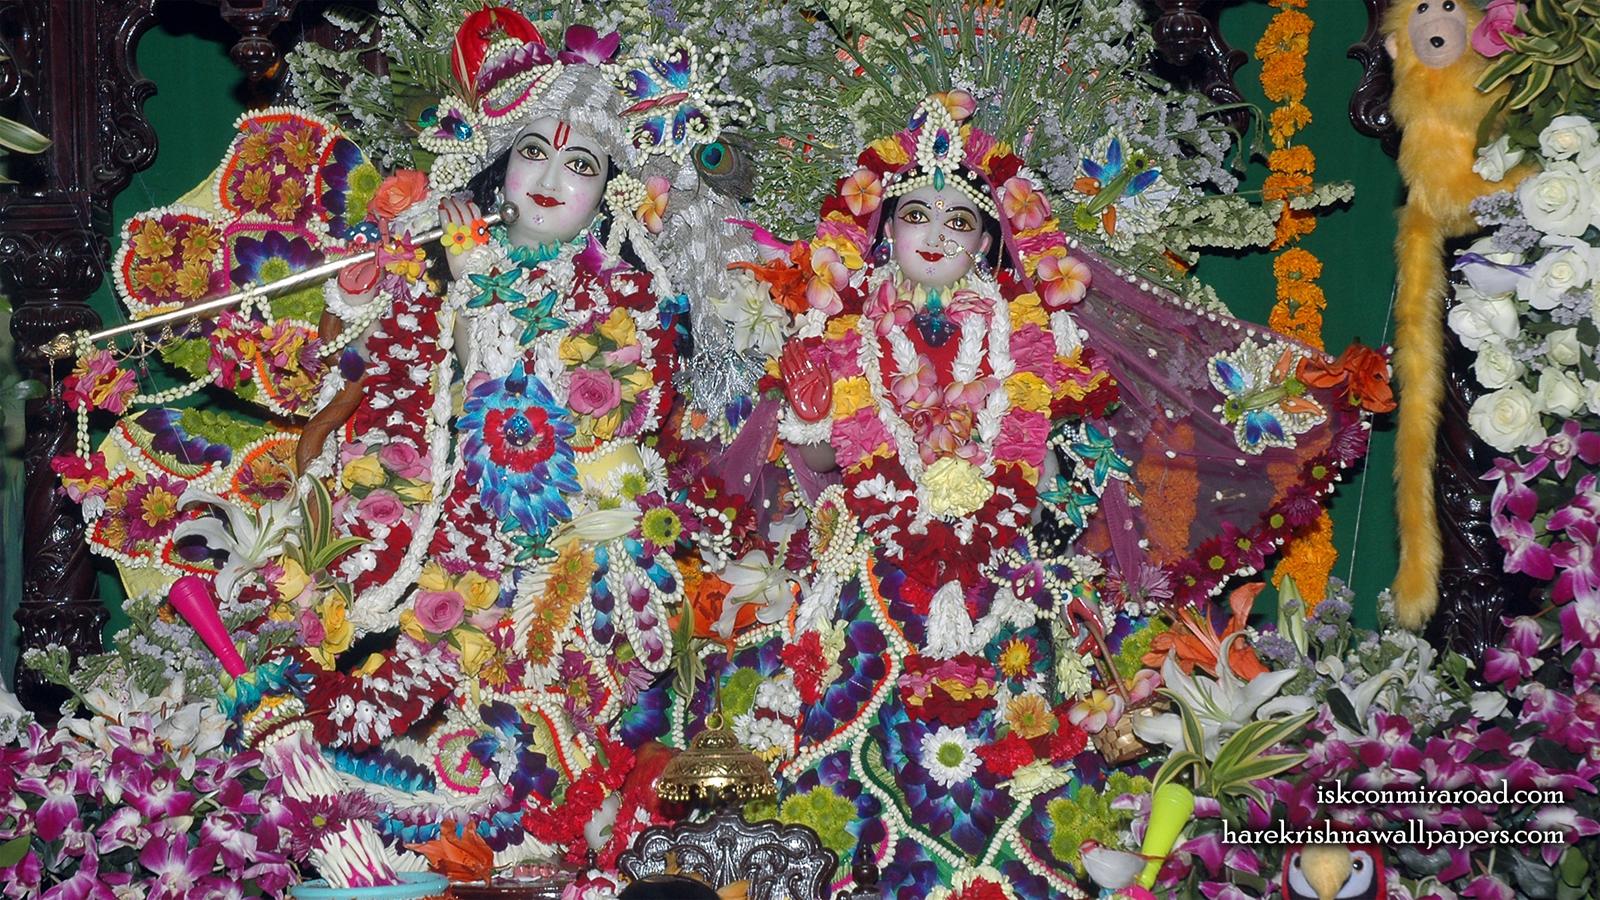 Sri Sri Radha Giridhari Wallpaper (012) Size 1600x900 Download